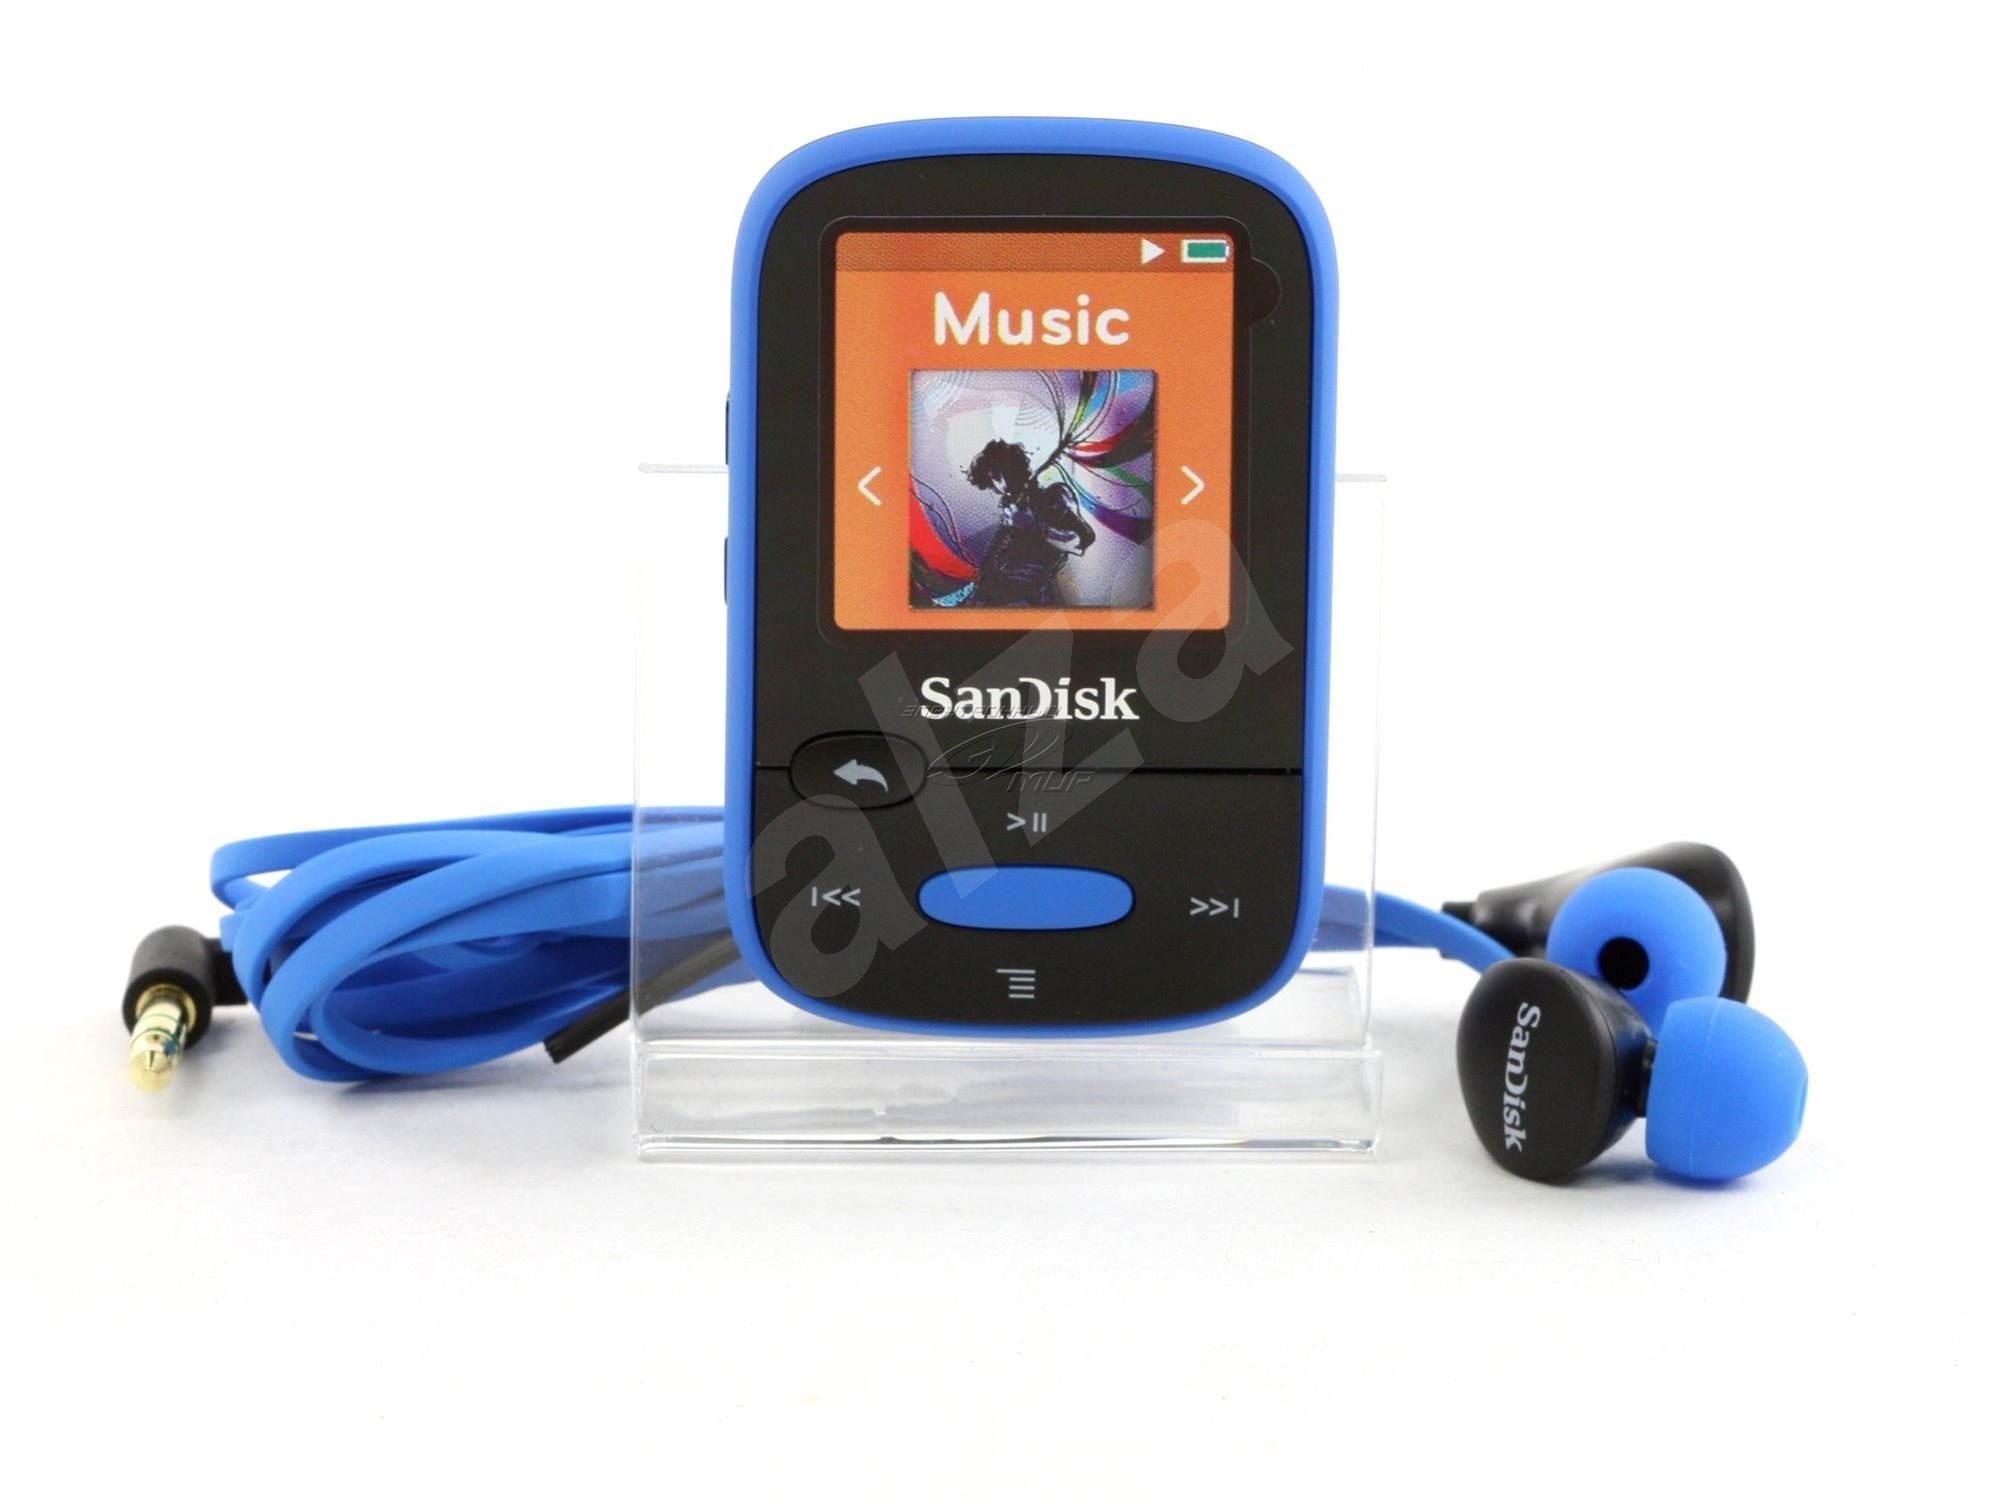 sandisk sansa clip sports 8 gb blau mp3 player. Black Bedroom Furniture Sets. Home Design Ideas